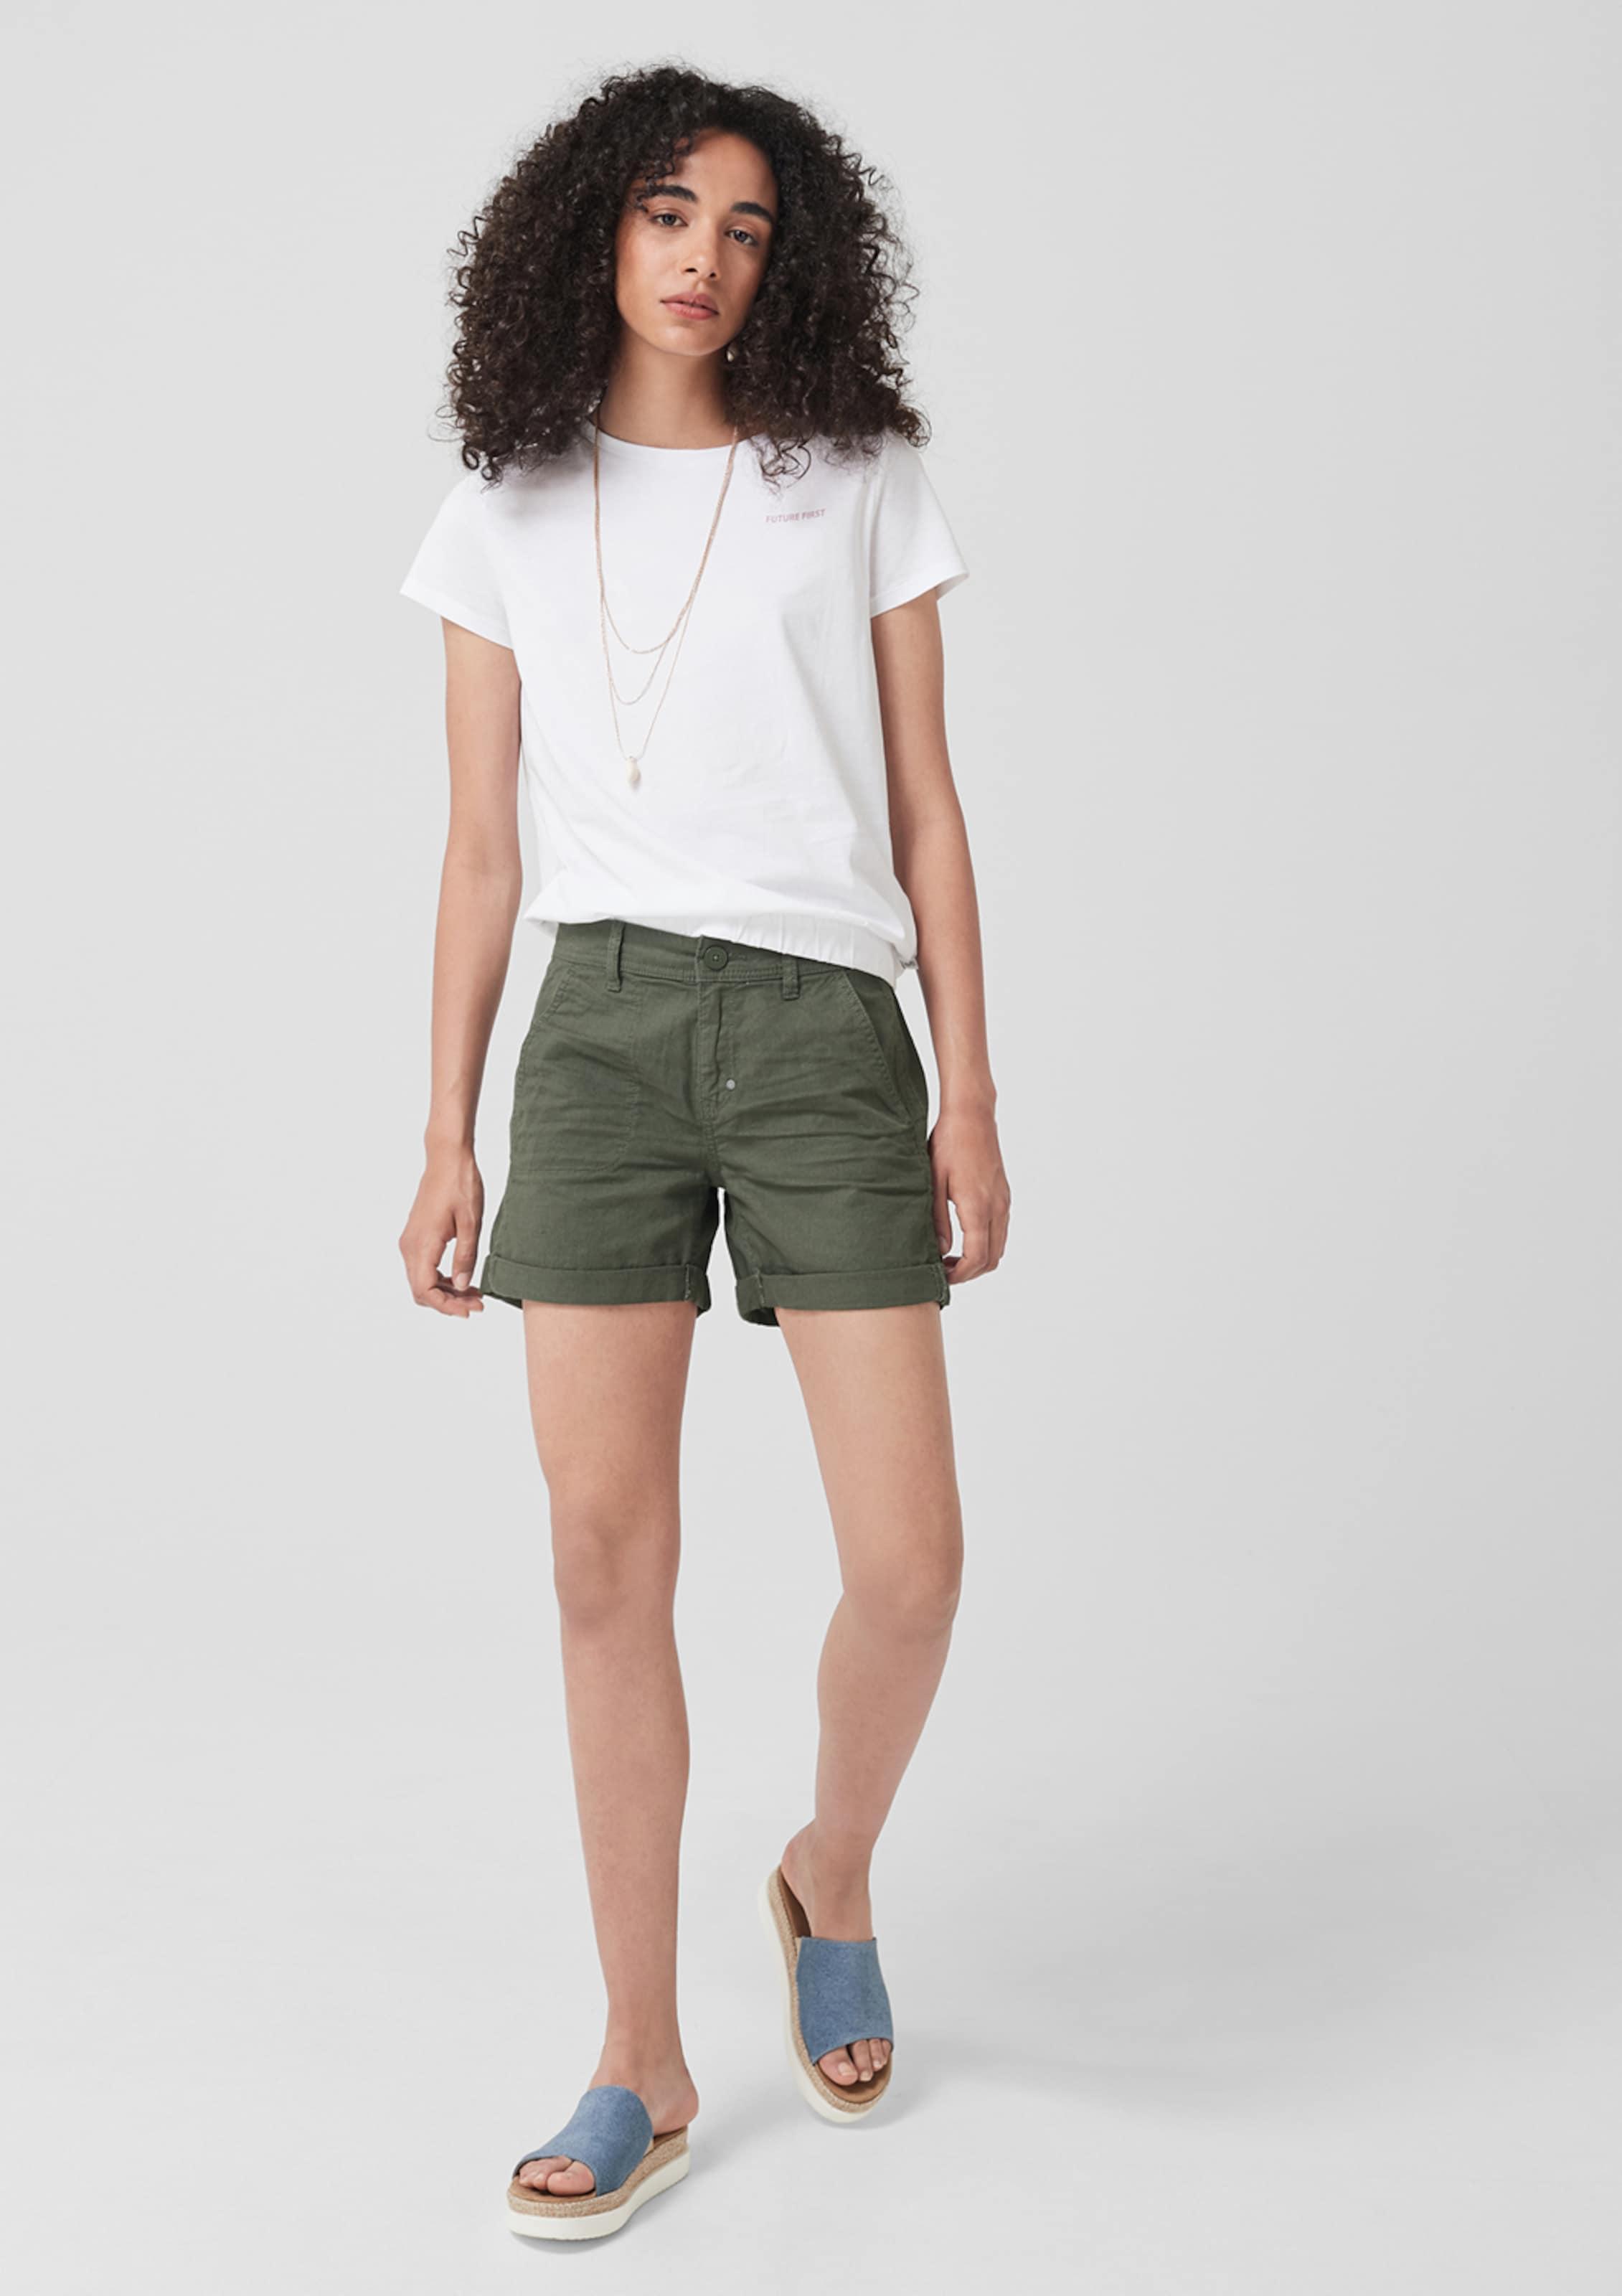 In By s Designed Khaki Q Shorts n0wNm8